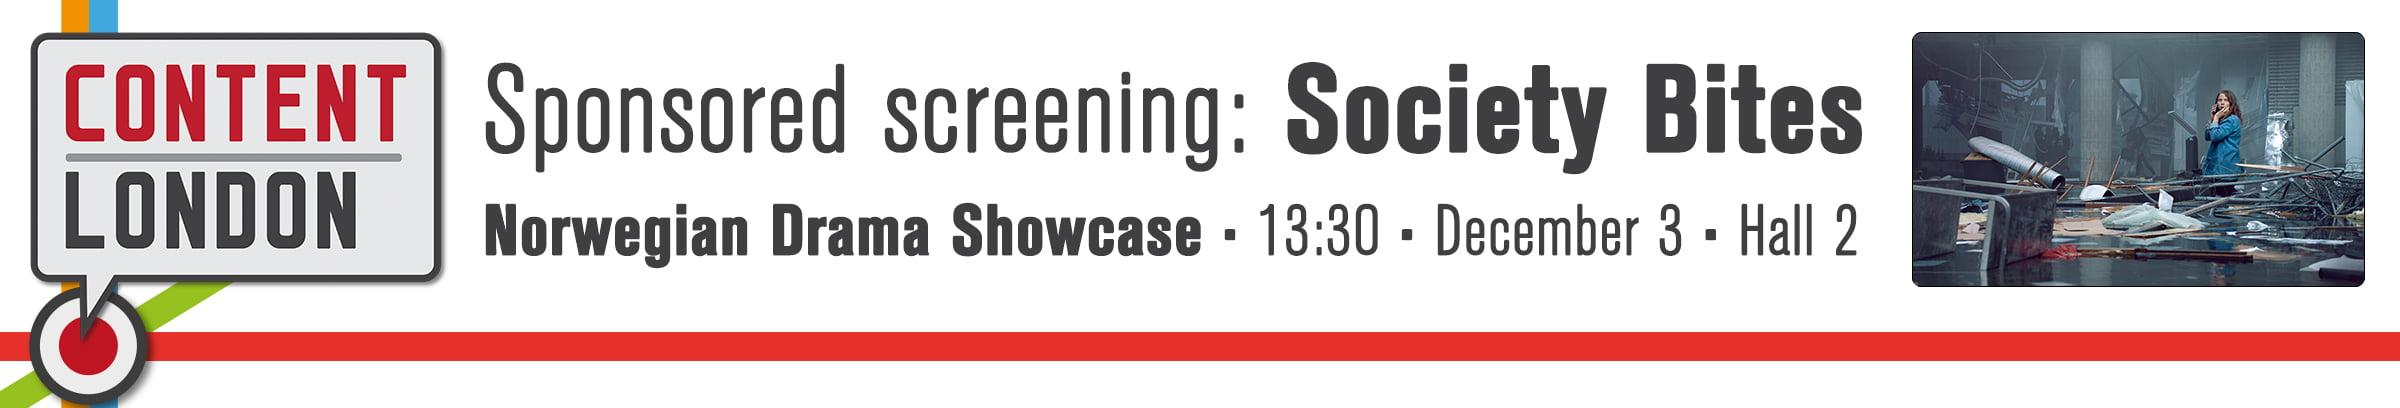 Norwegian Drama Showcase